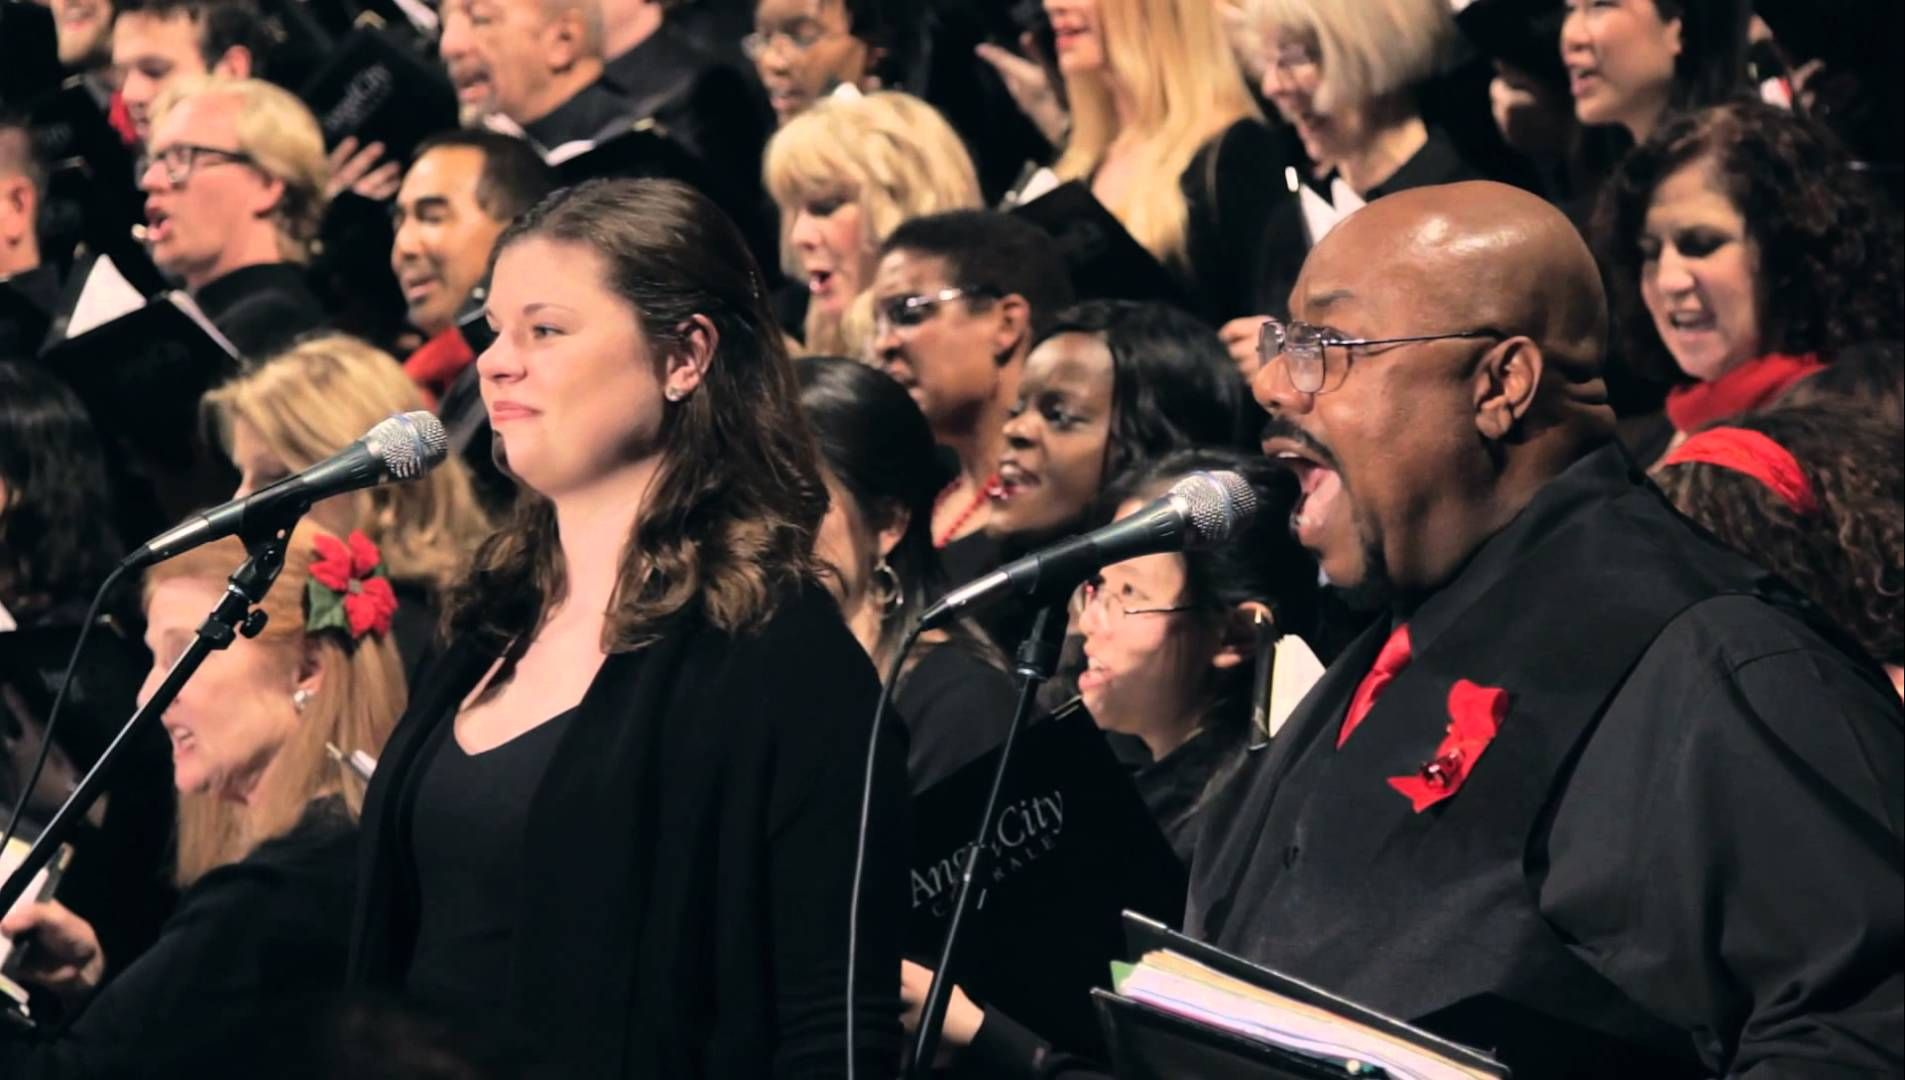 Do You Hear What I Hear? | Concert, Christmas music, Music